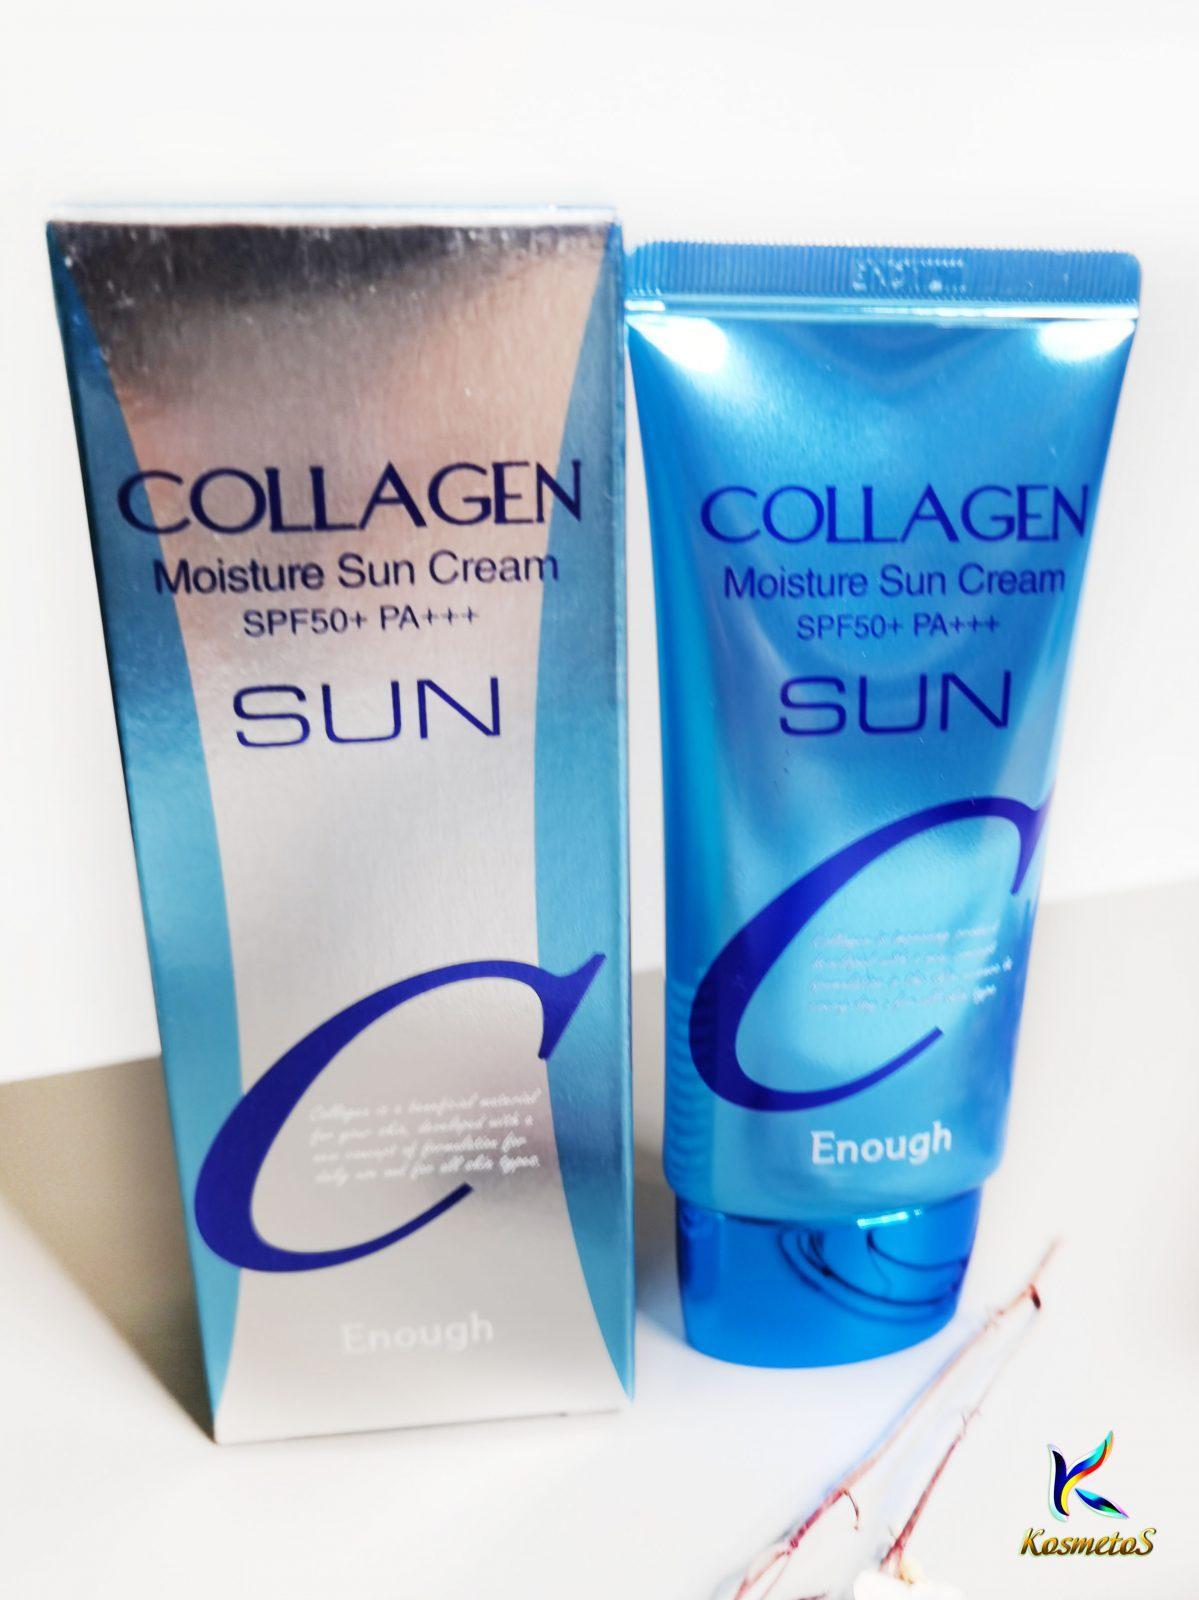 Enough Collagen Moisture Sun Cream SPF50+ PA+++ 50ml